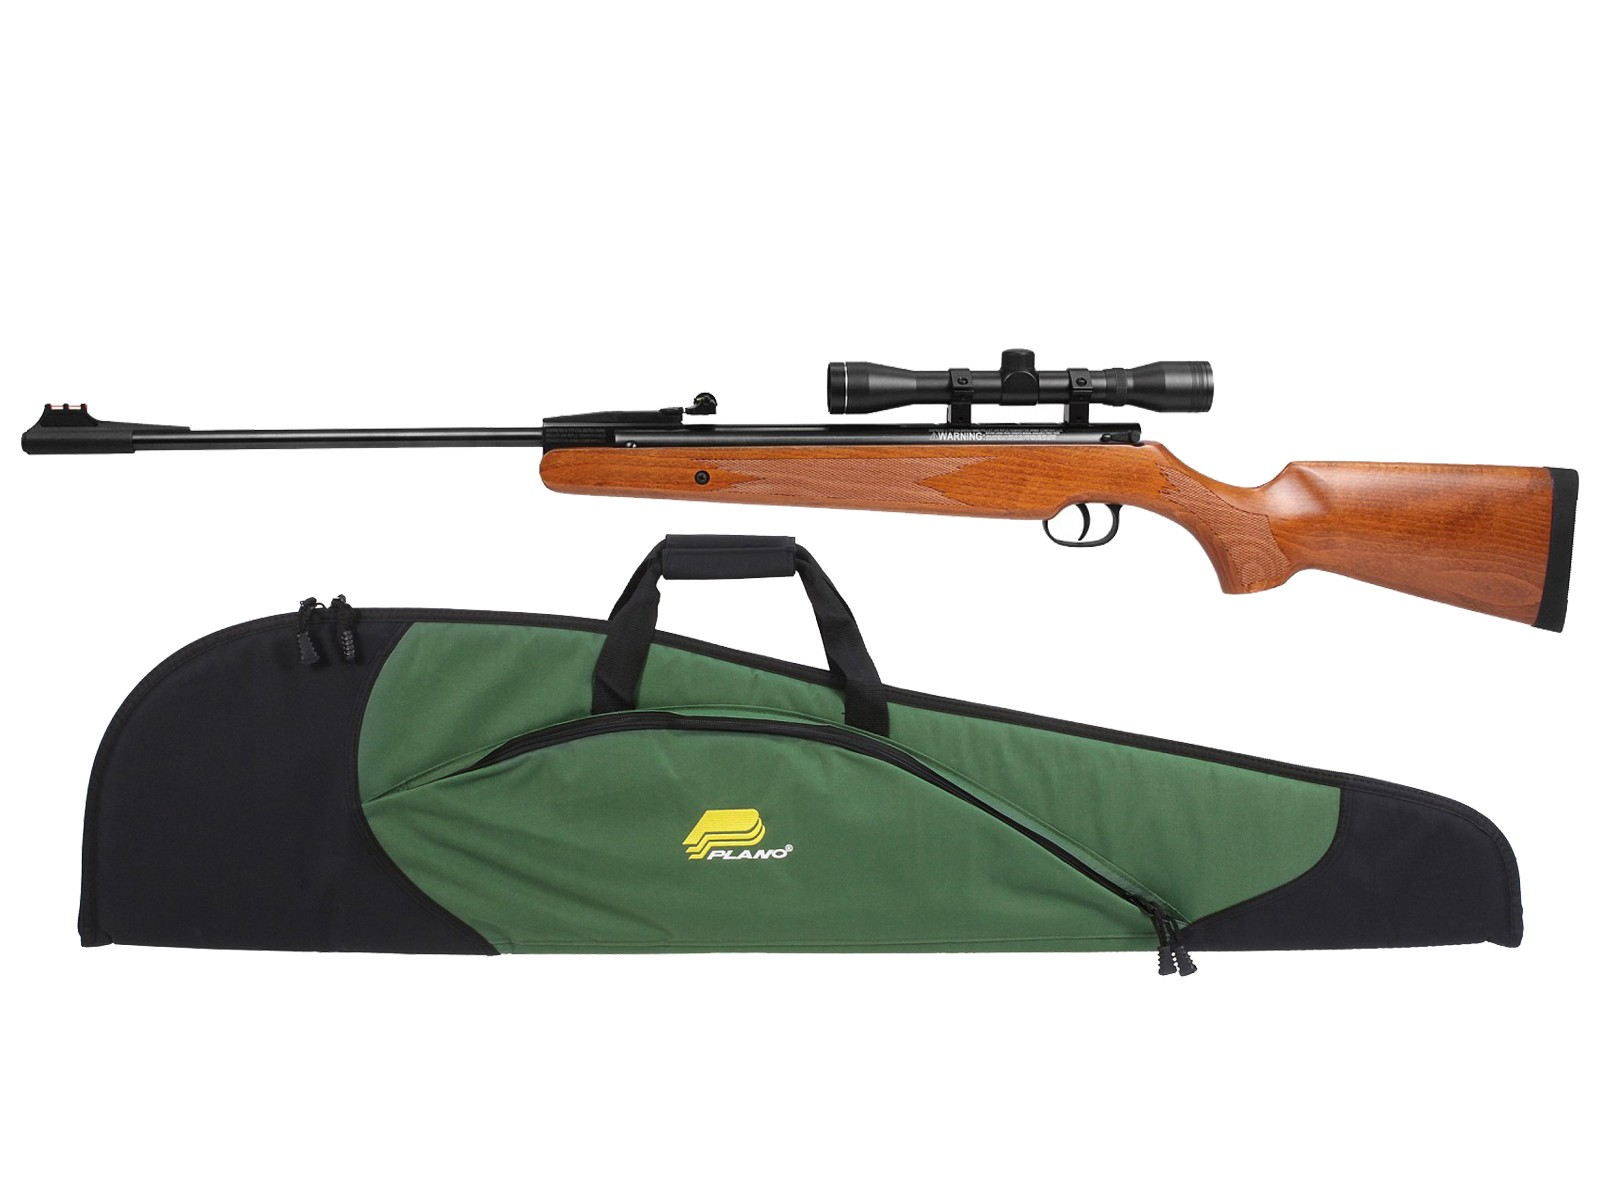 Remington Express Air Rifle